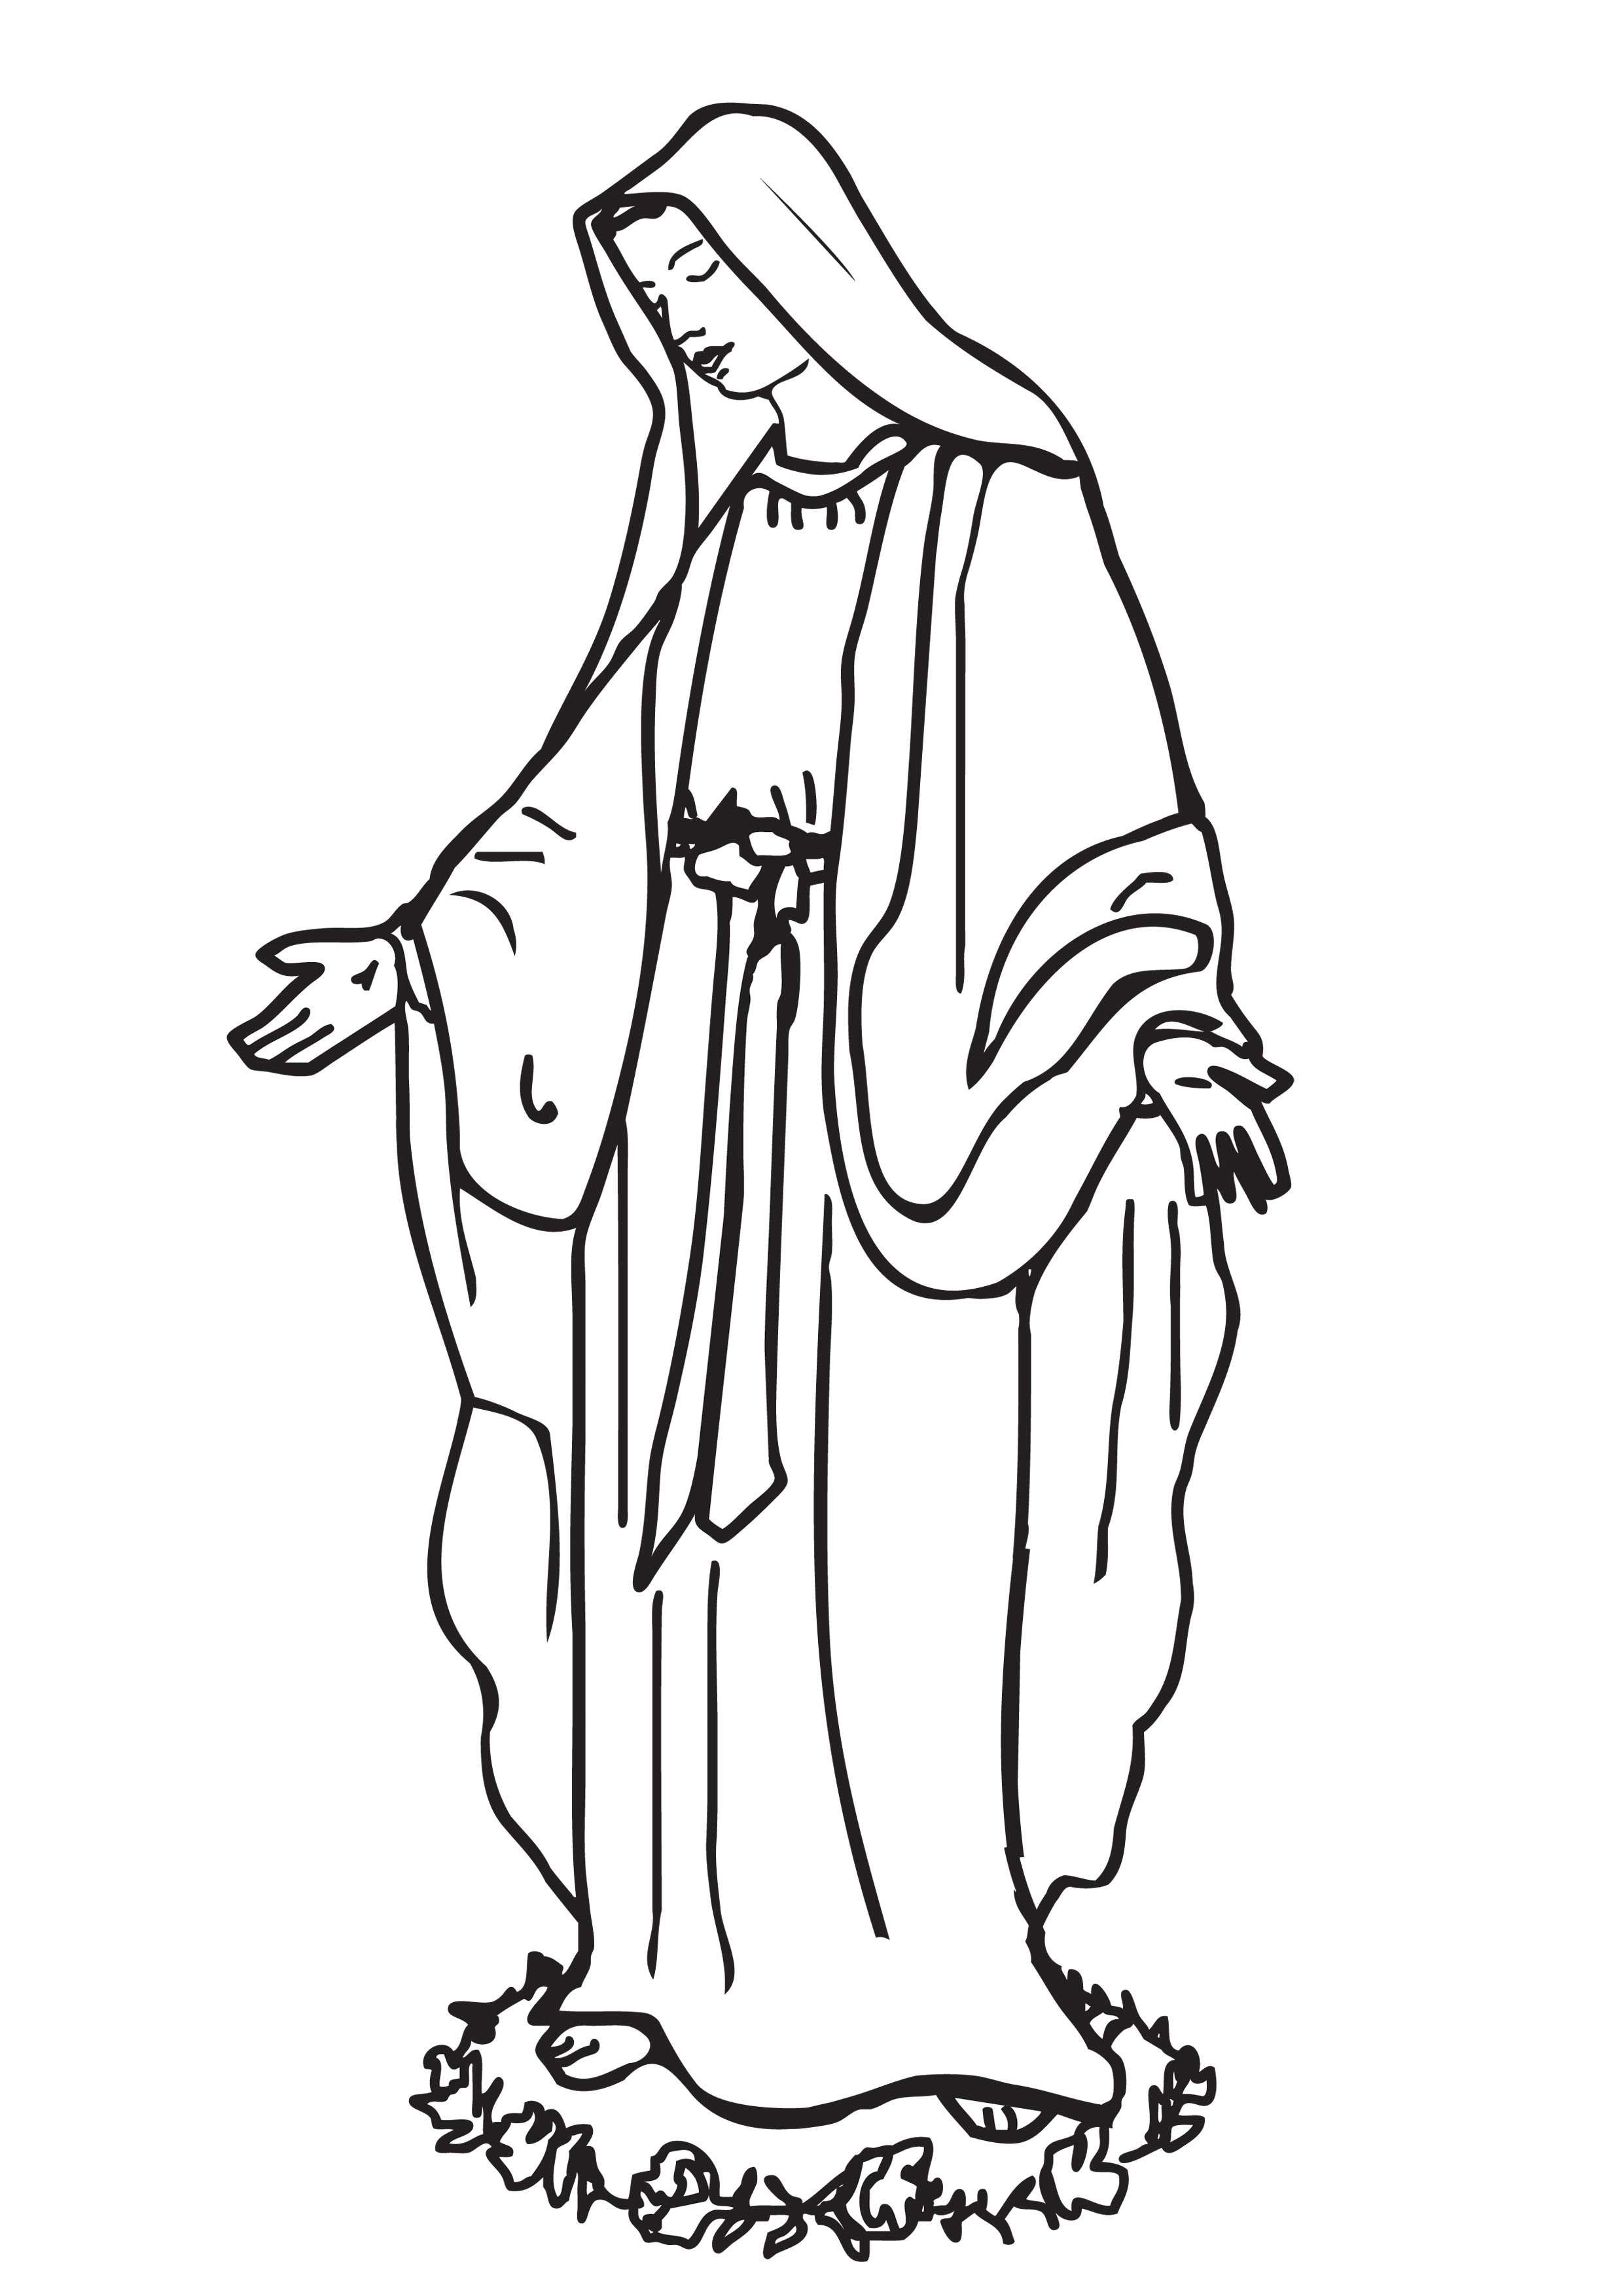 Familia Catolica Santos Hermosas Paginas Para Colorear De Catholic Coloring Jesus Painting Coloring Pages